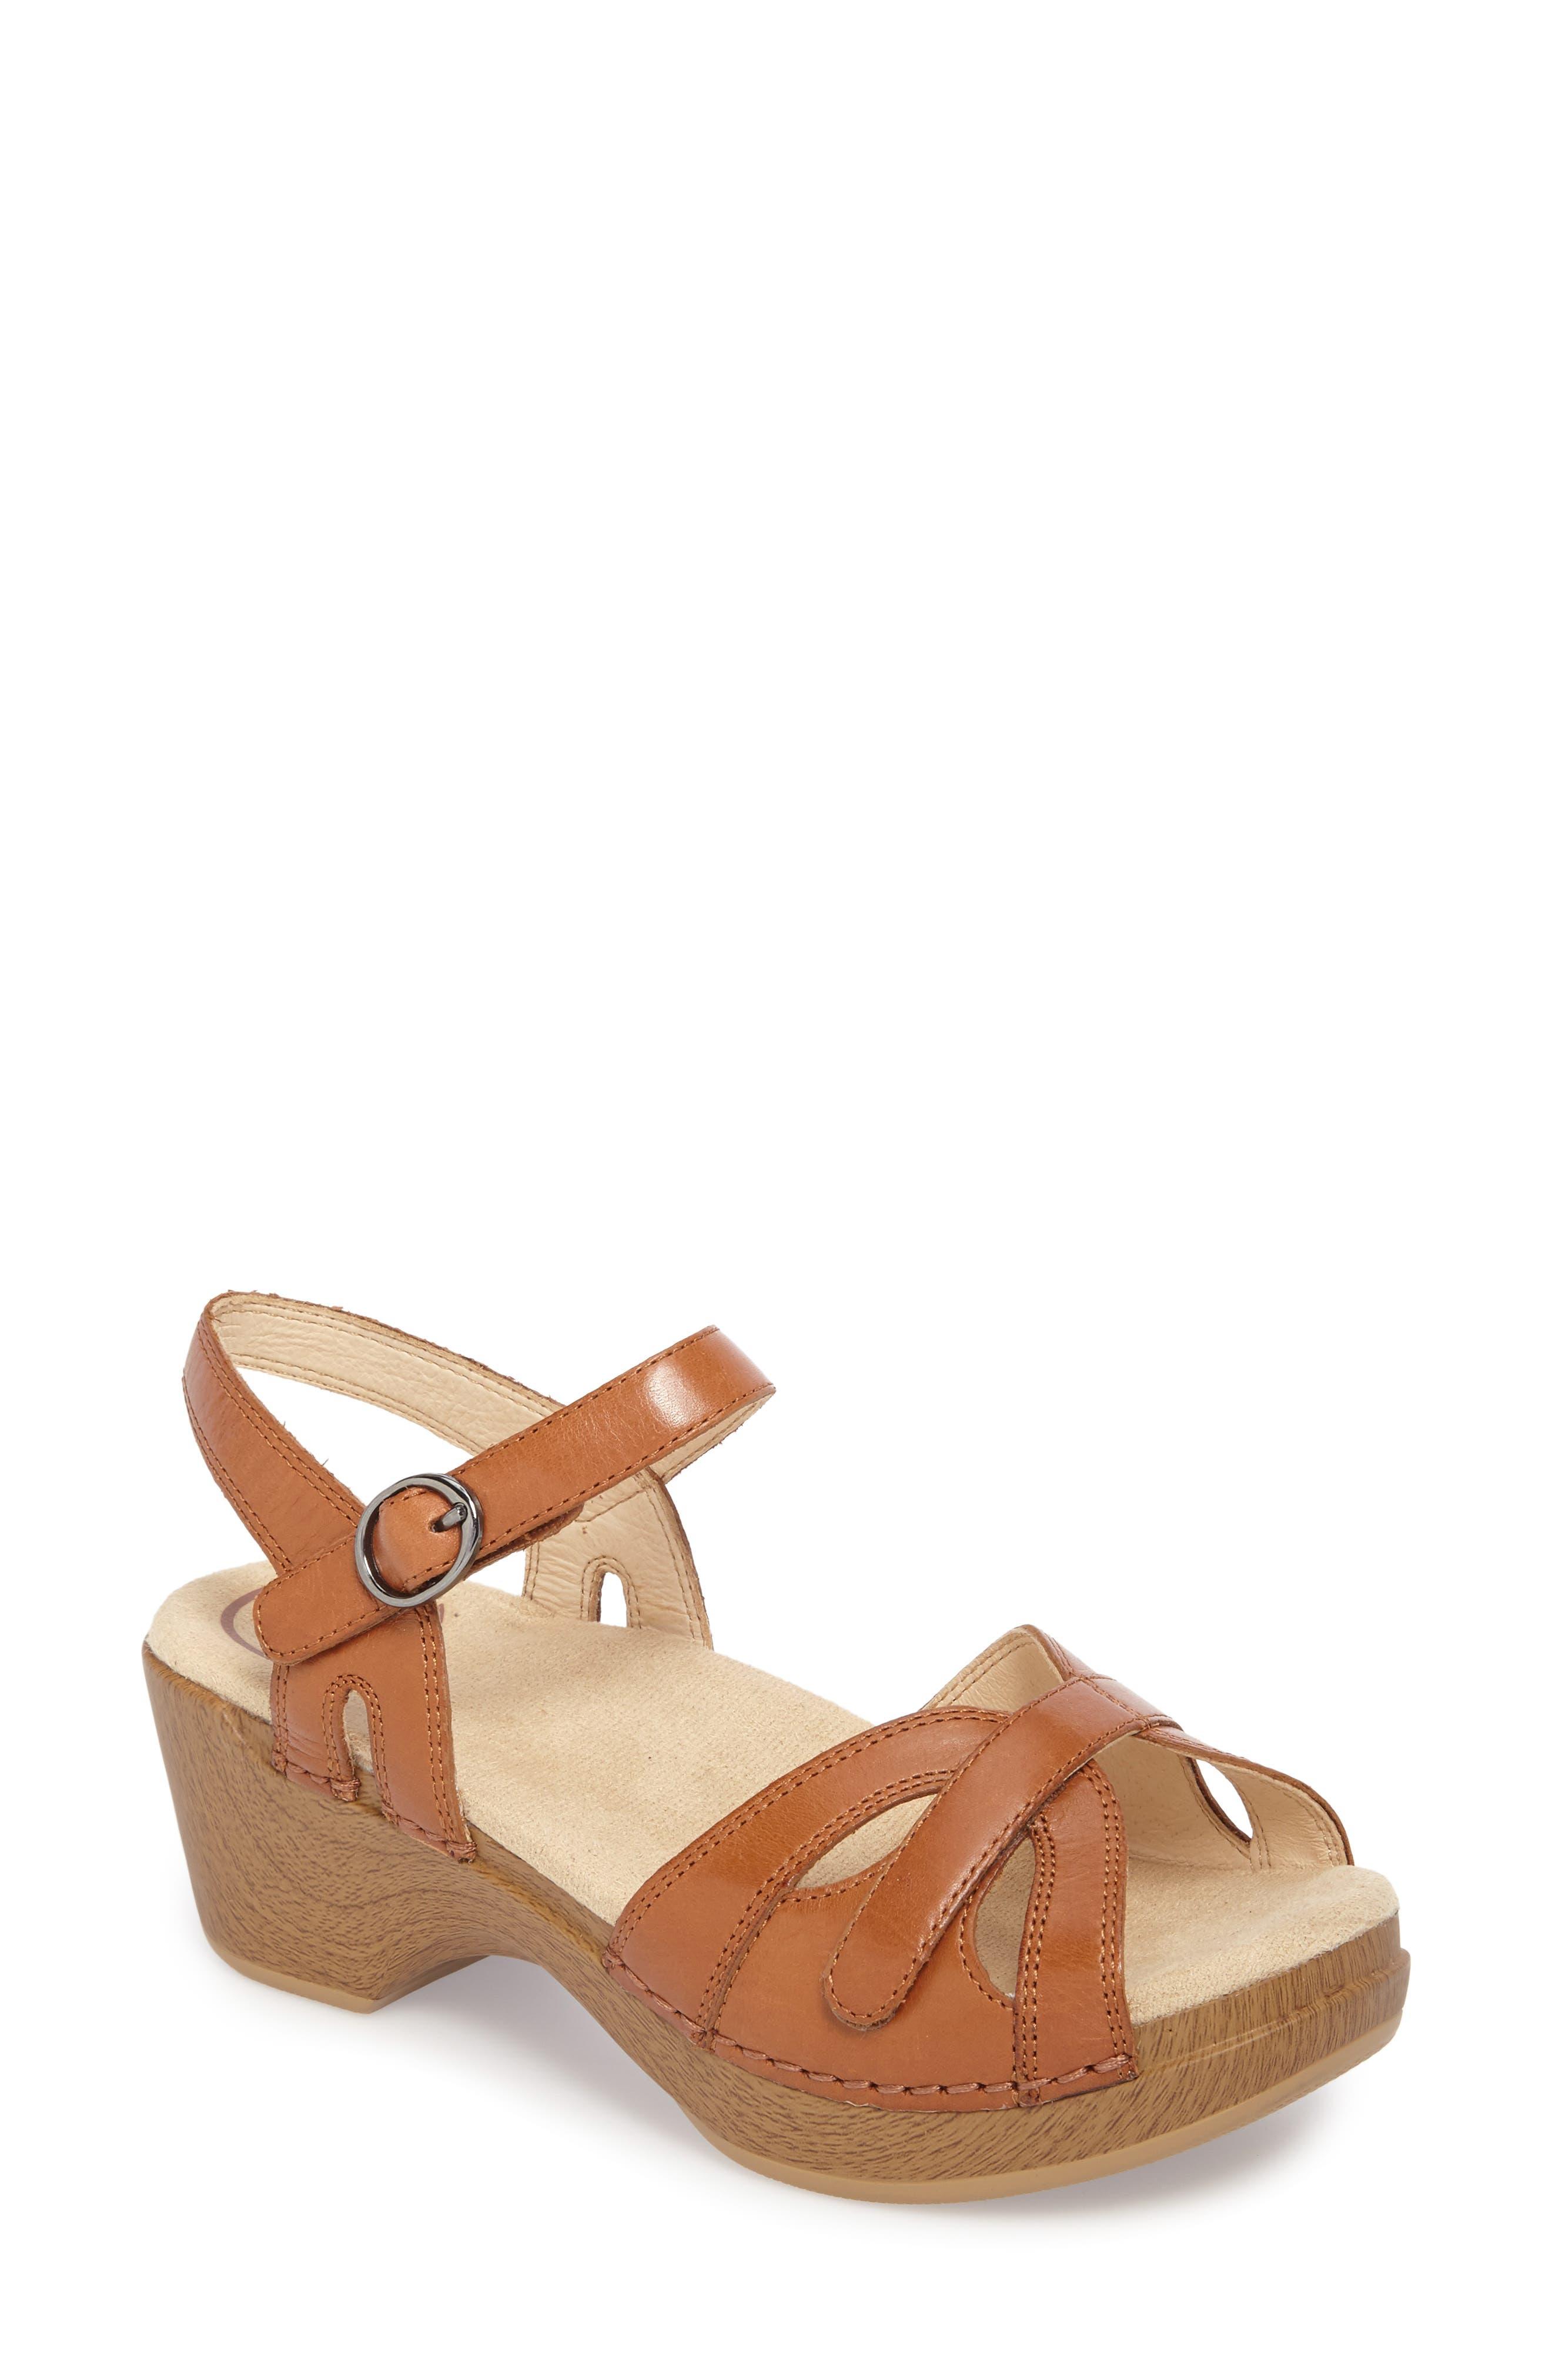 Alternate Image 1 Selected - Dansko Season Sandal (Women)